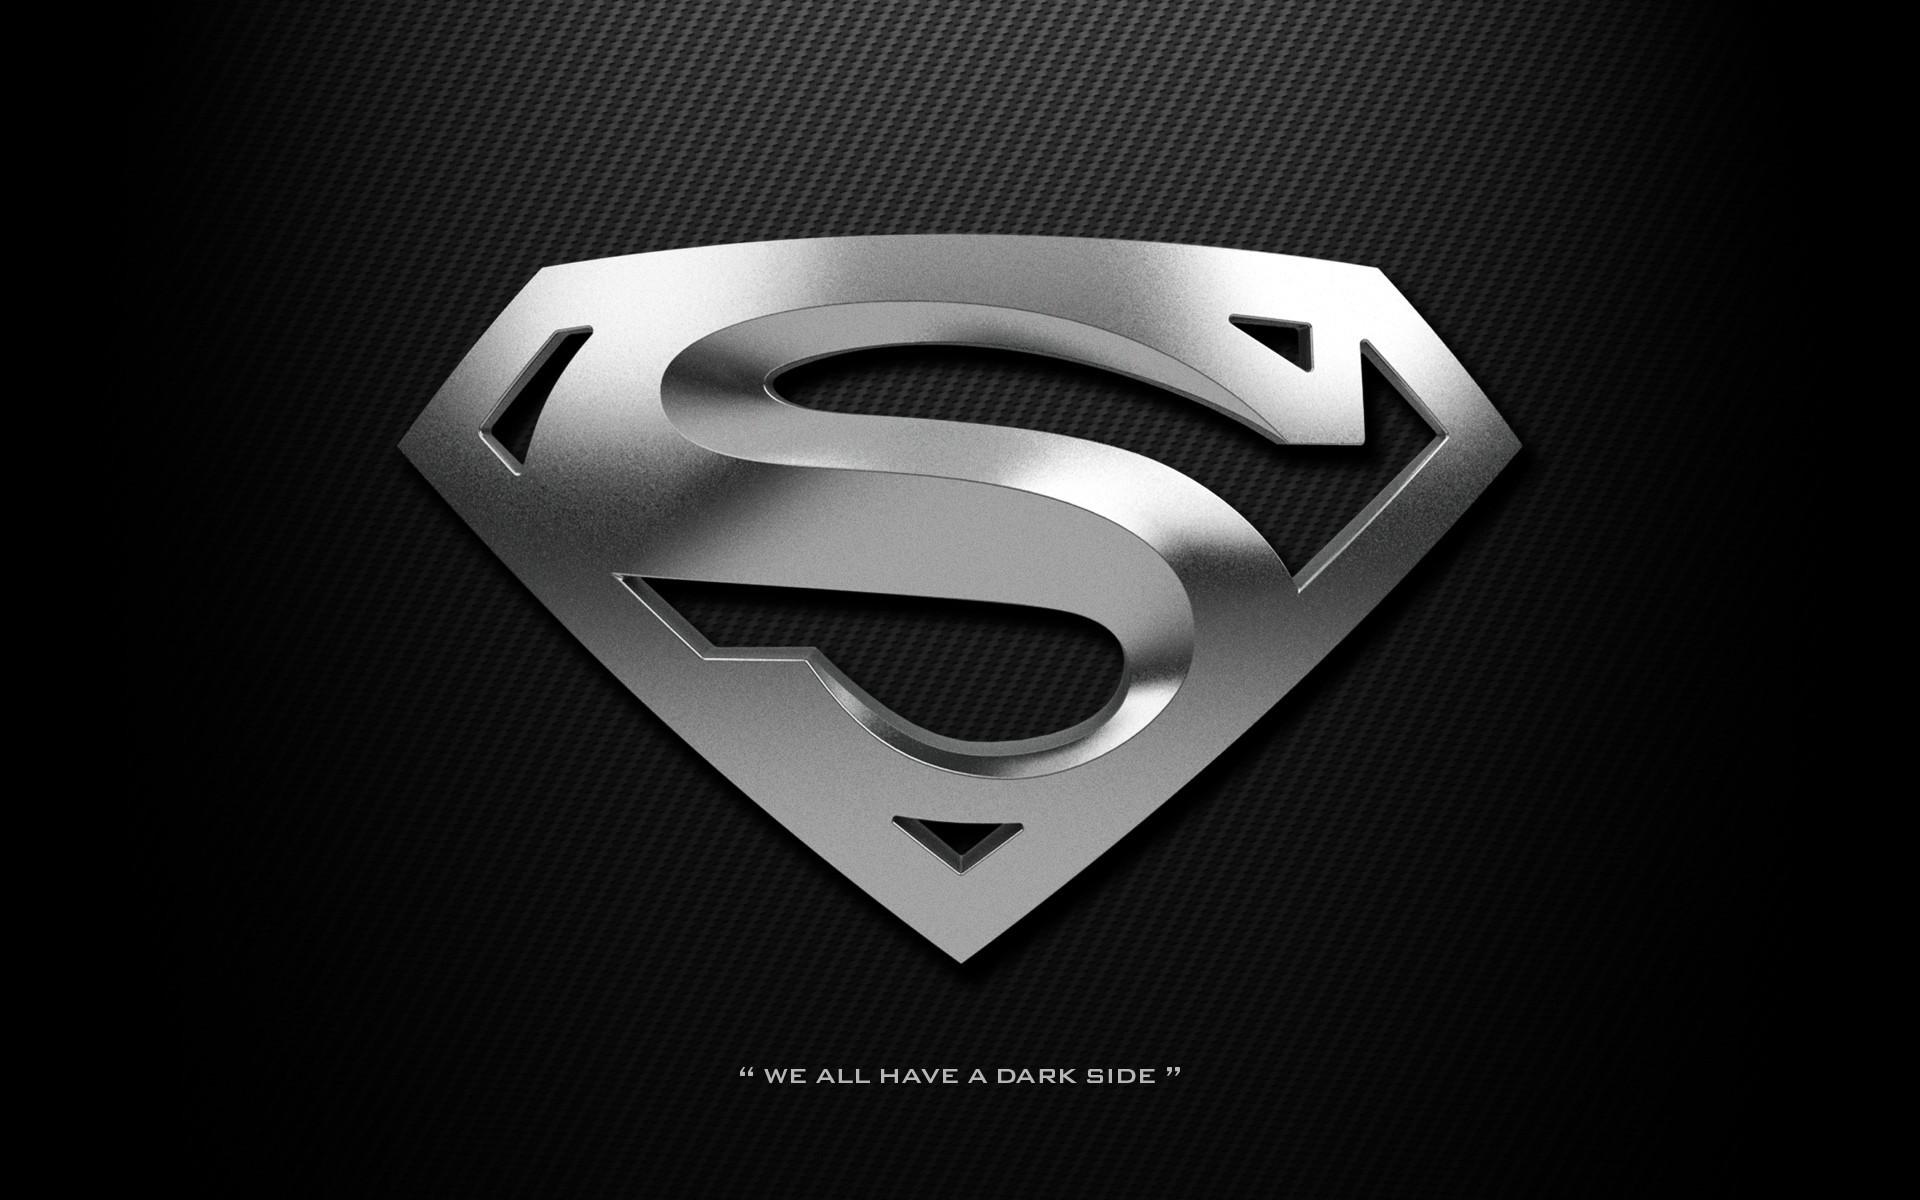 Man of Steel logo wallpaper 14921 1920x1200